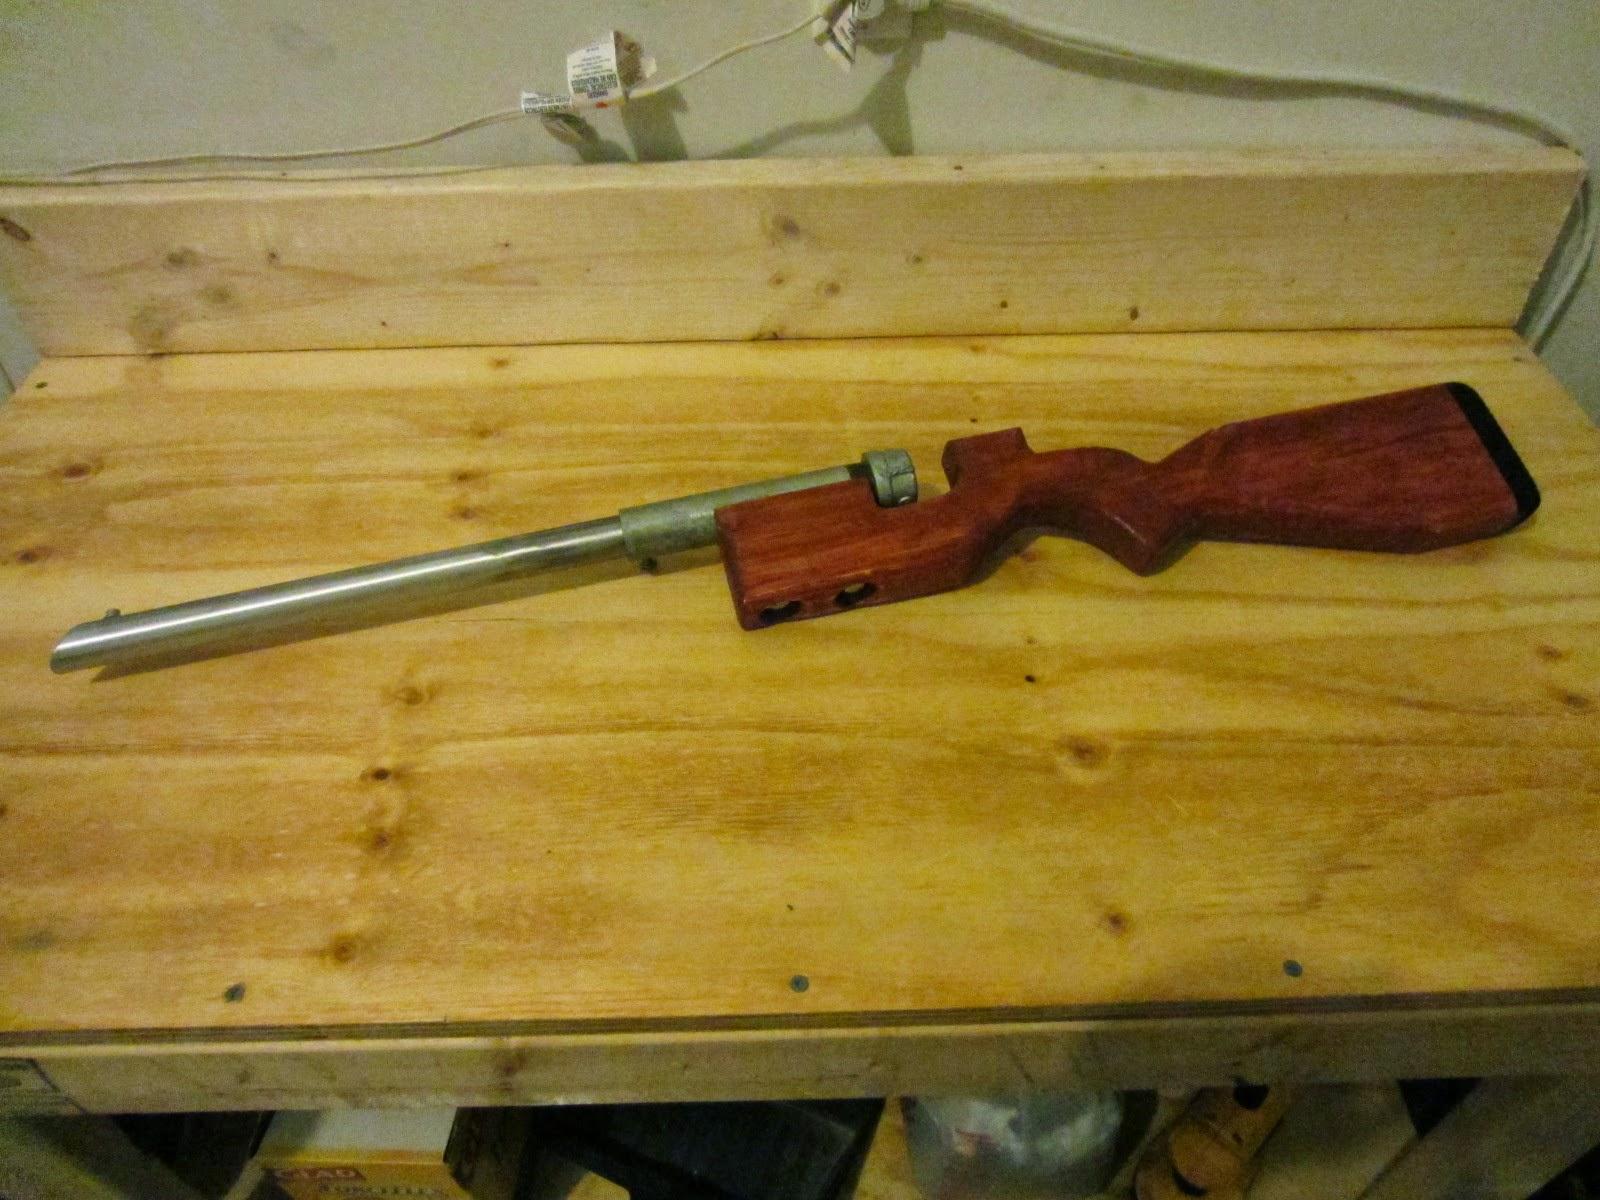 Homemade 12 Gauge Pipe Shotgun | From mind to machine